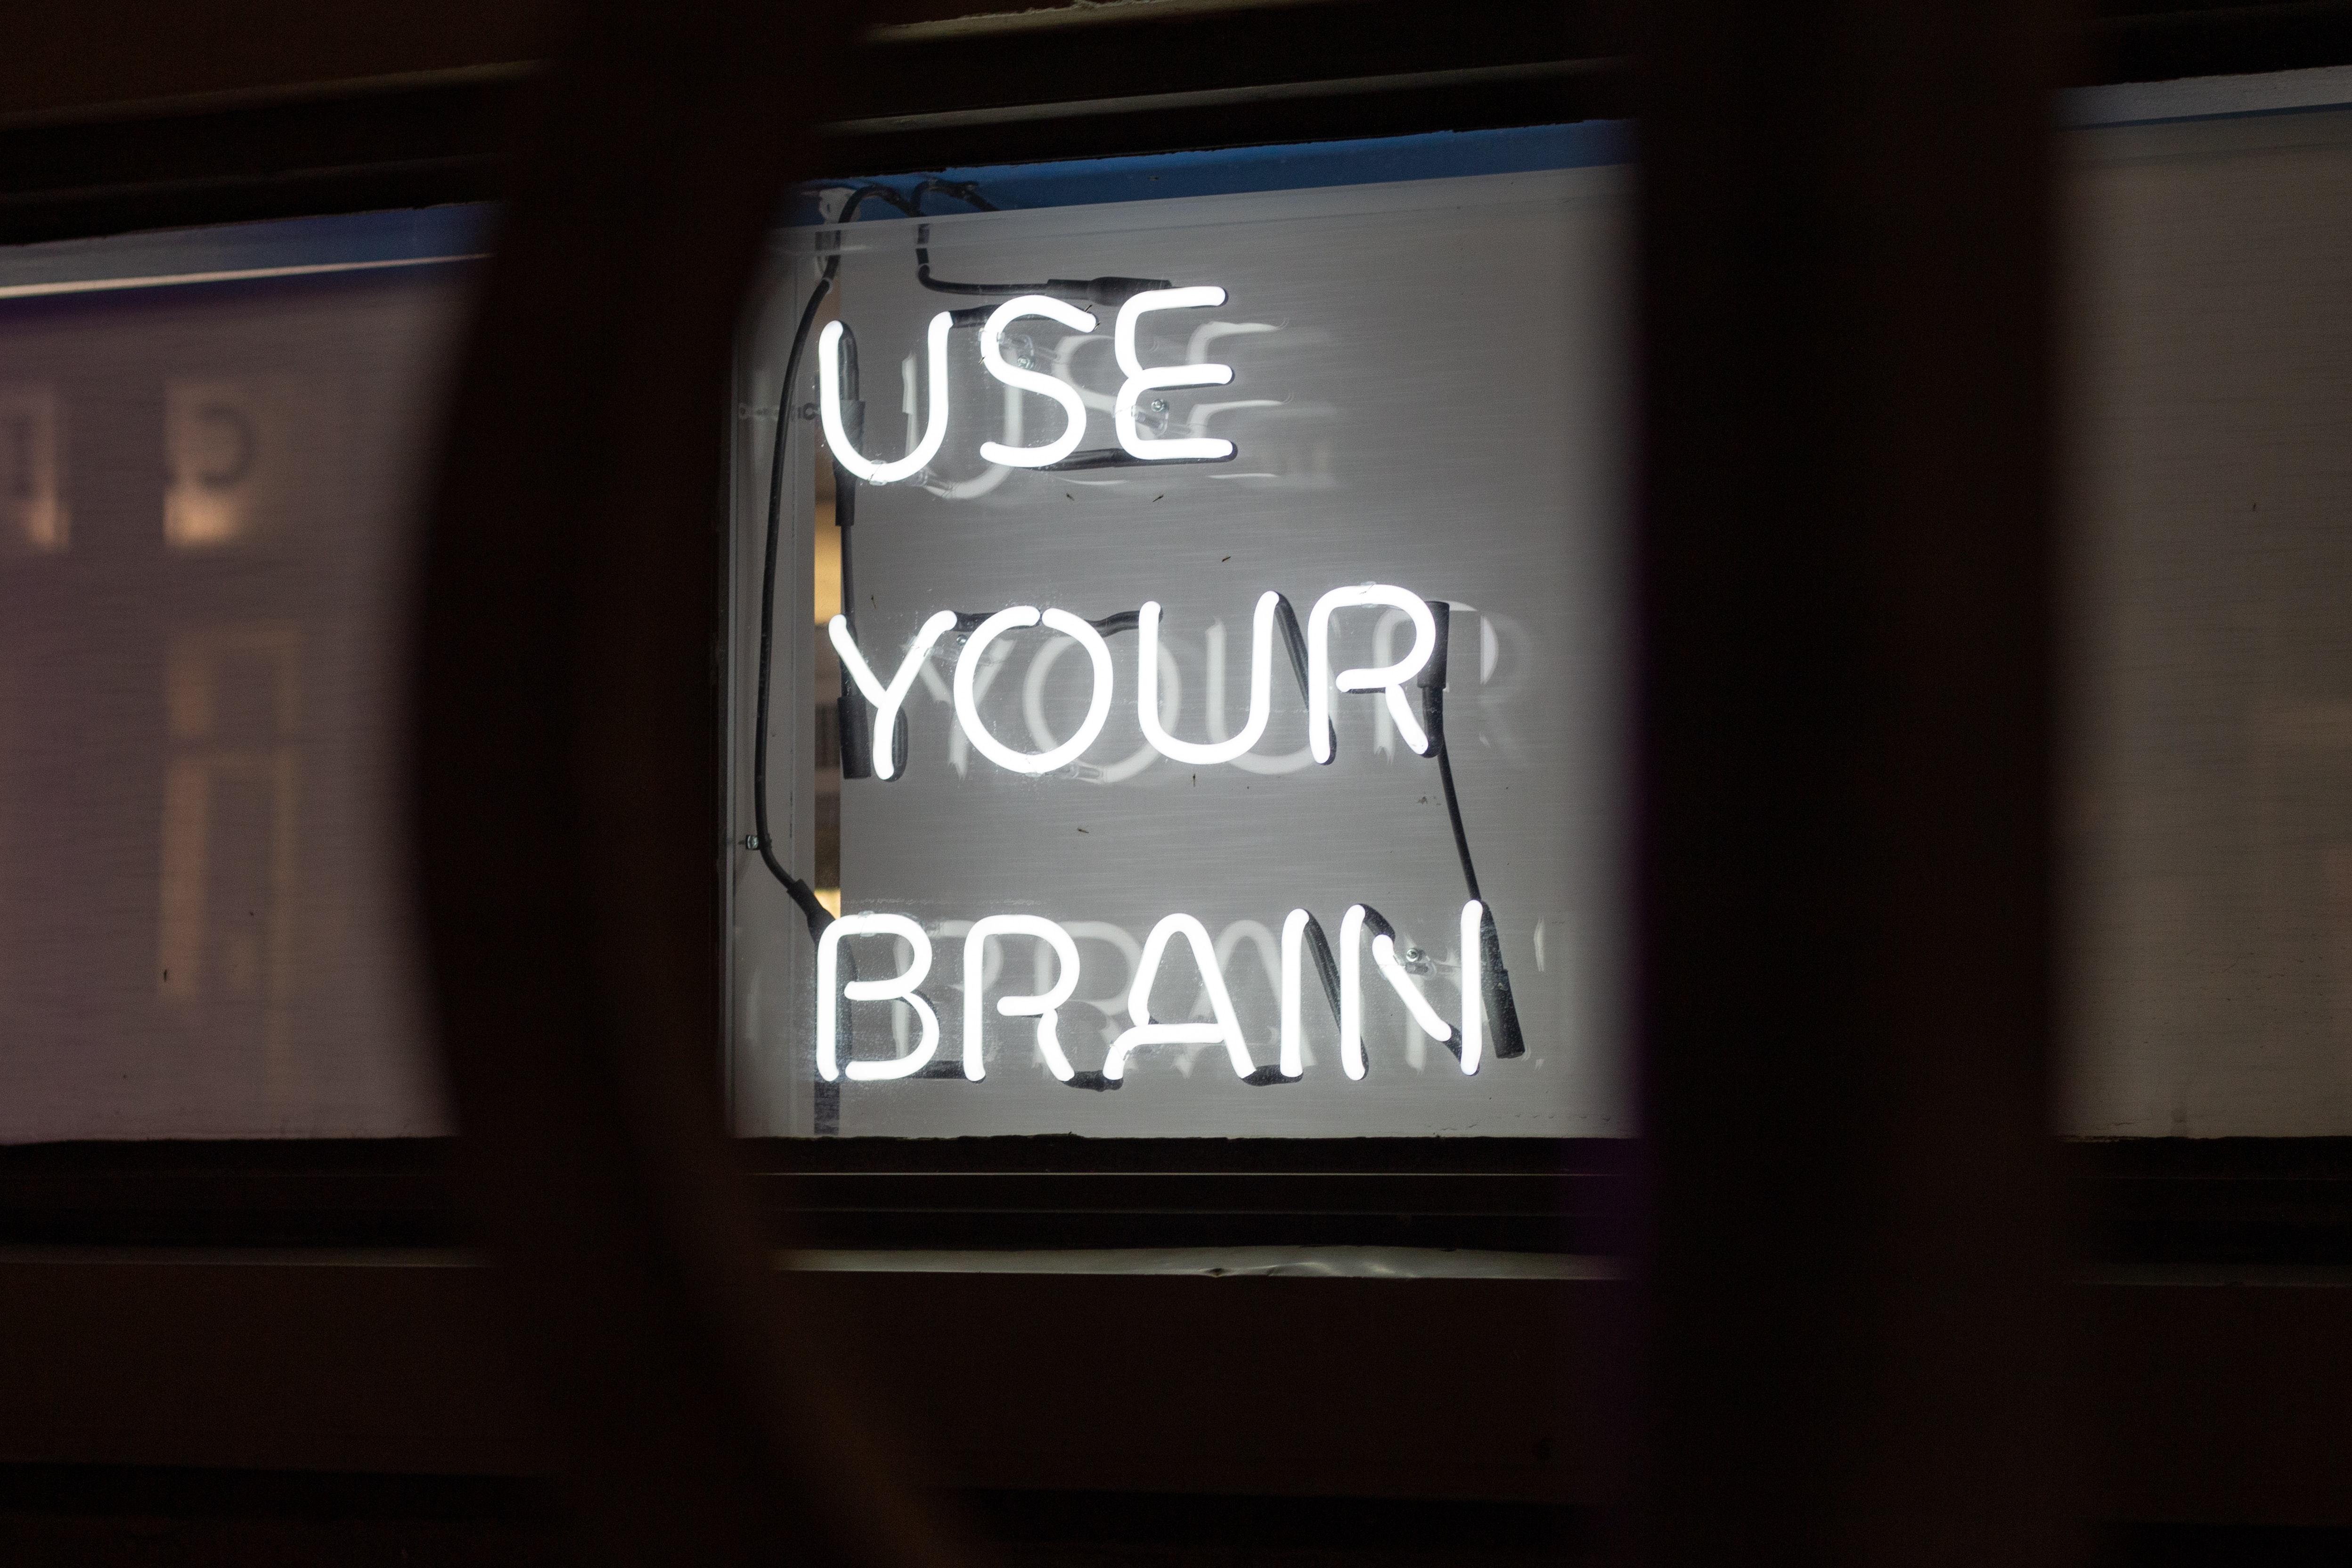 use-your-brain-signage